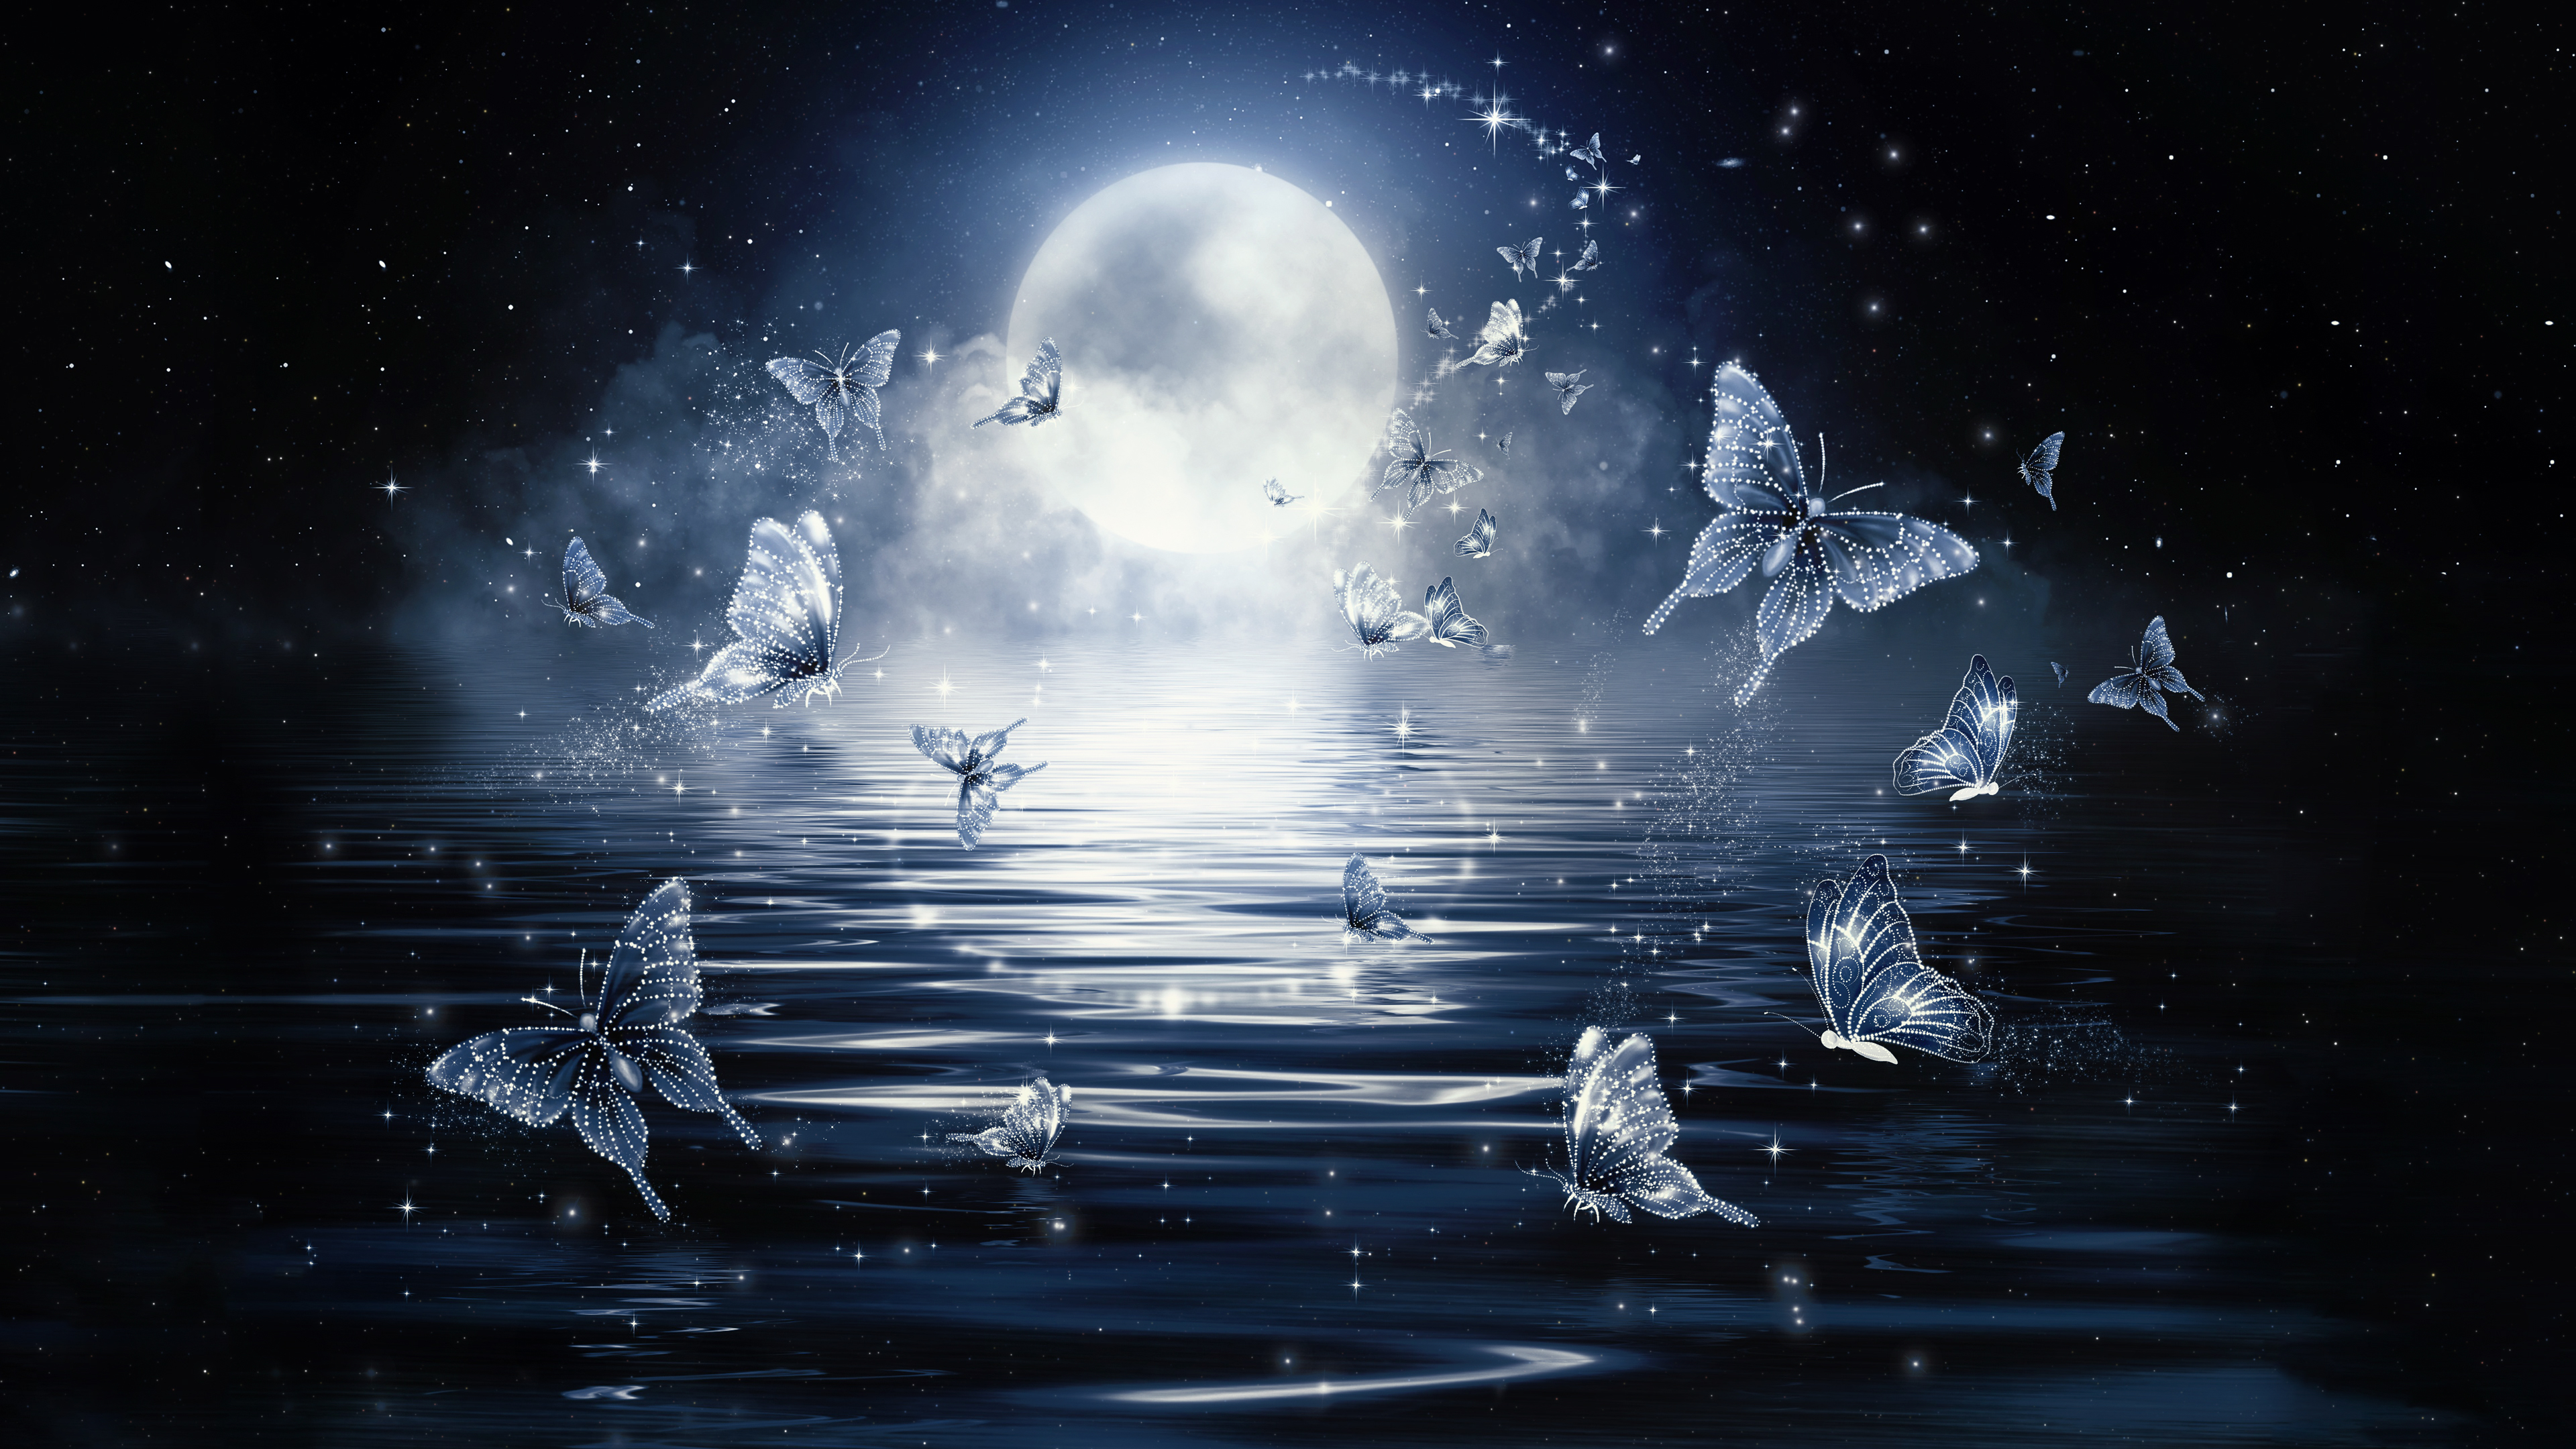 4k Moon Butterflies Wallpaper Hd